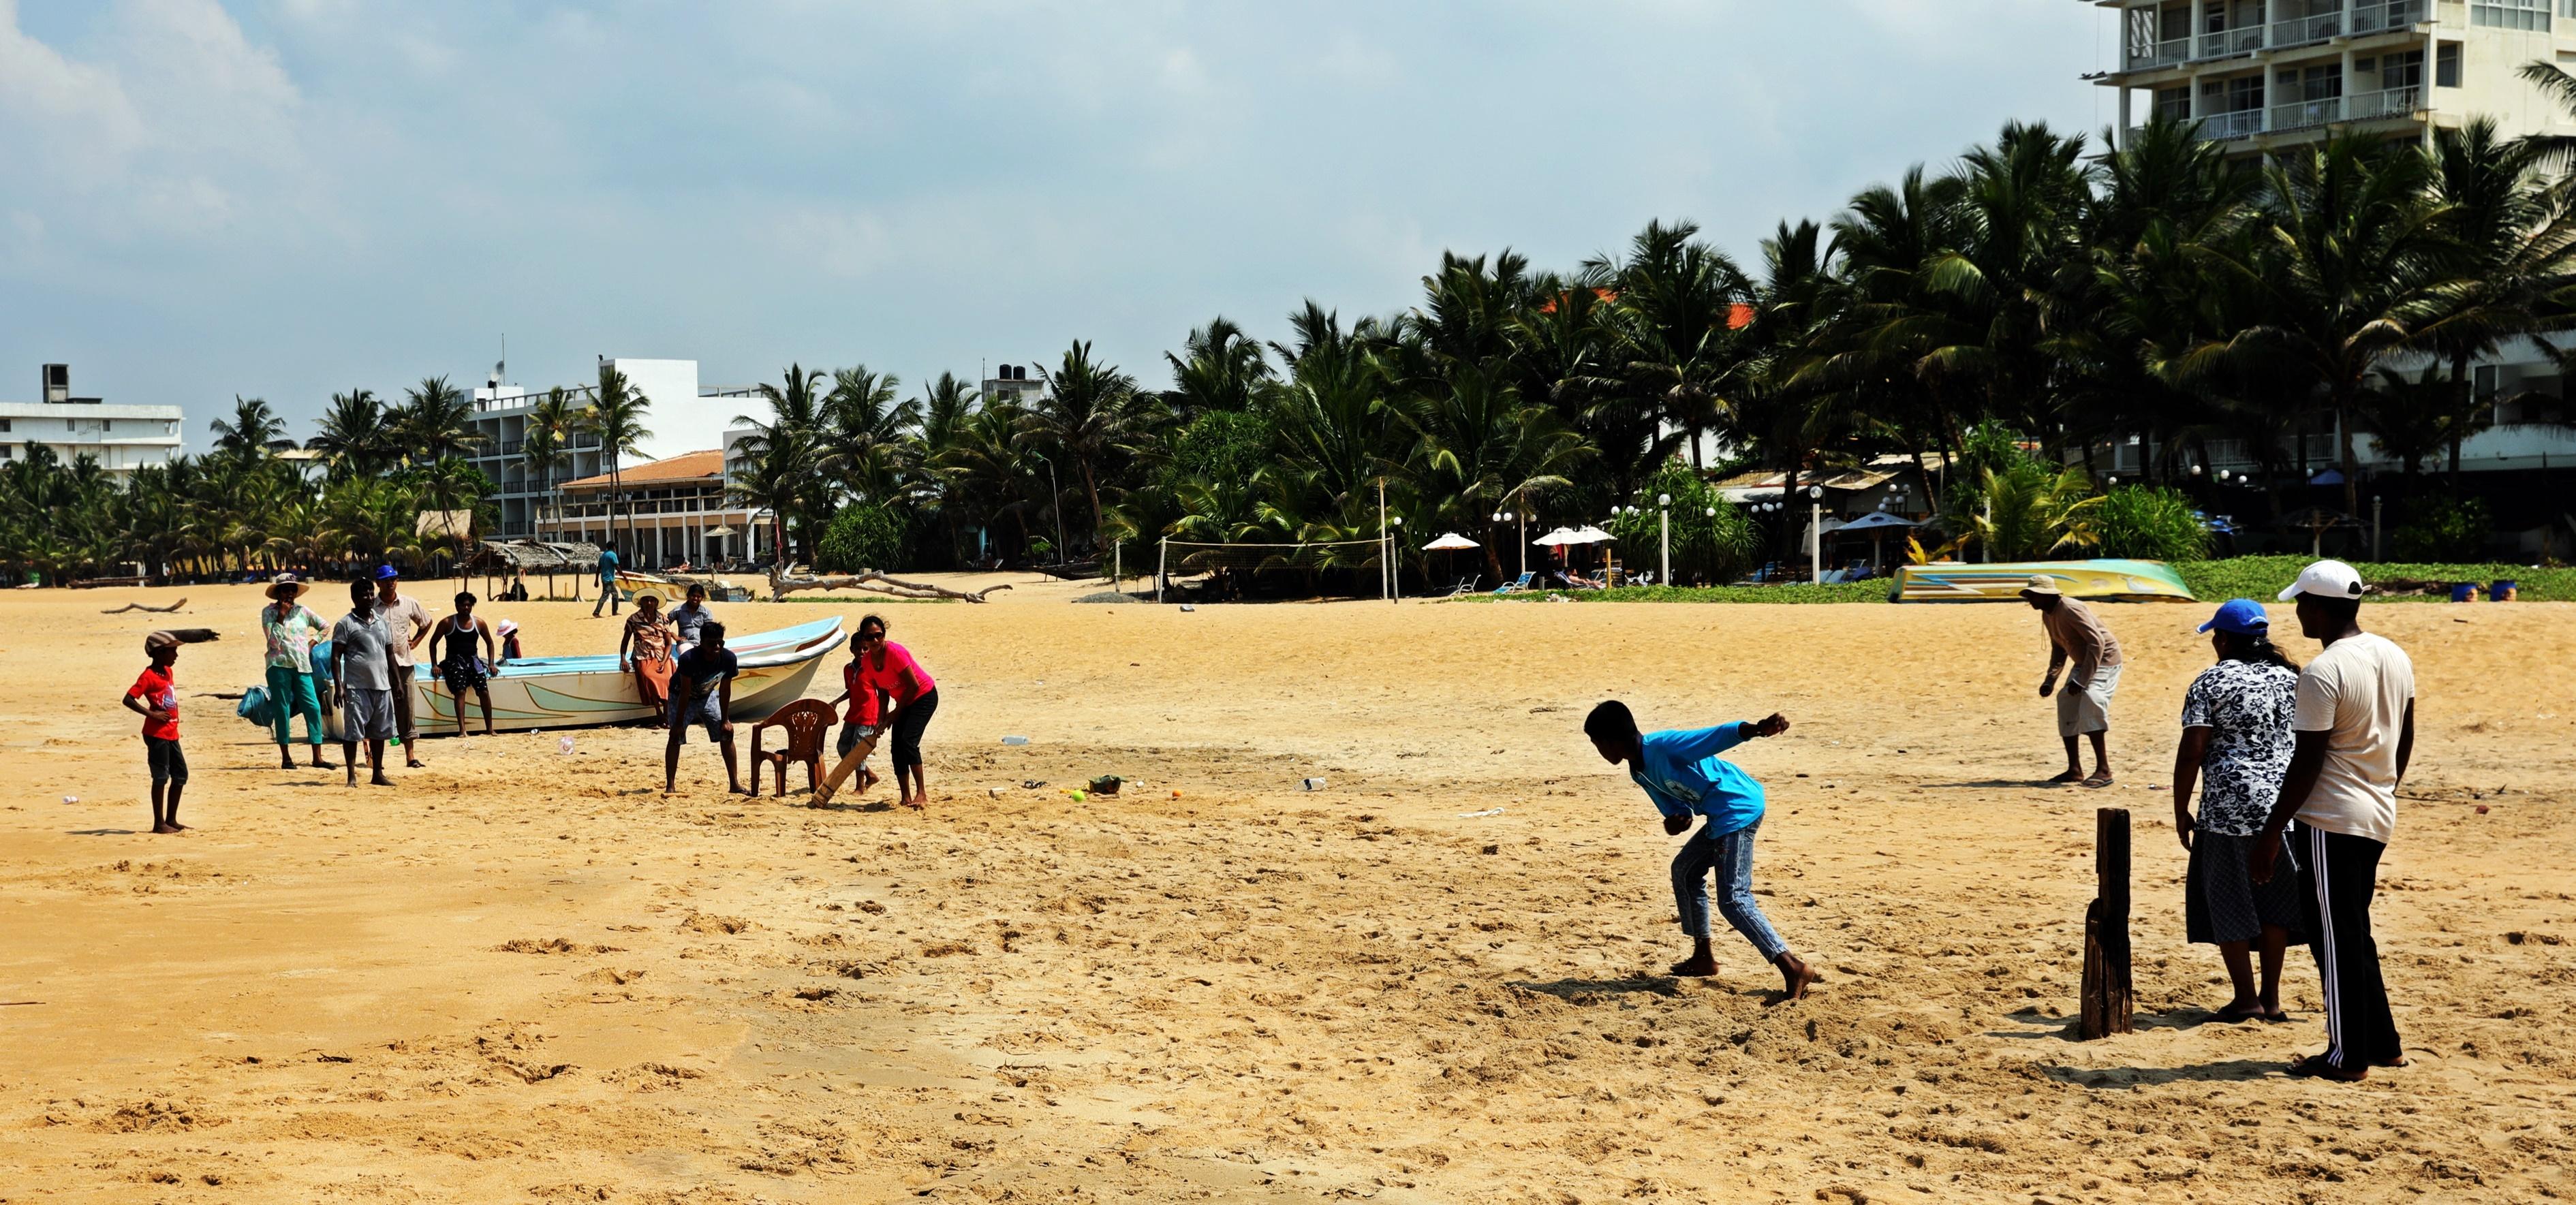 Cricket game, Negombo Beach